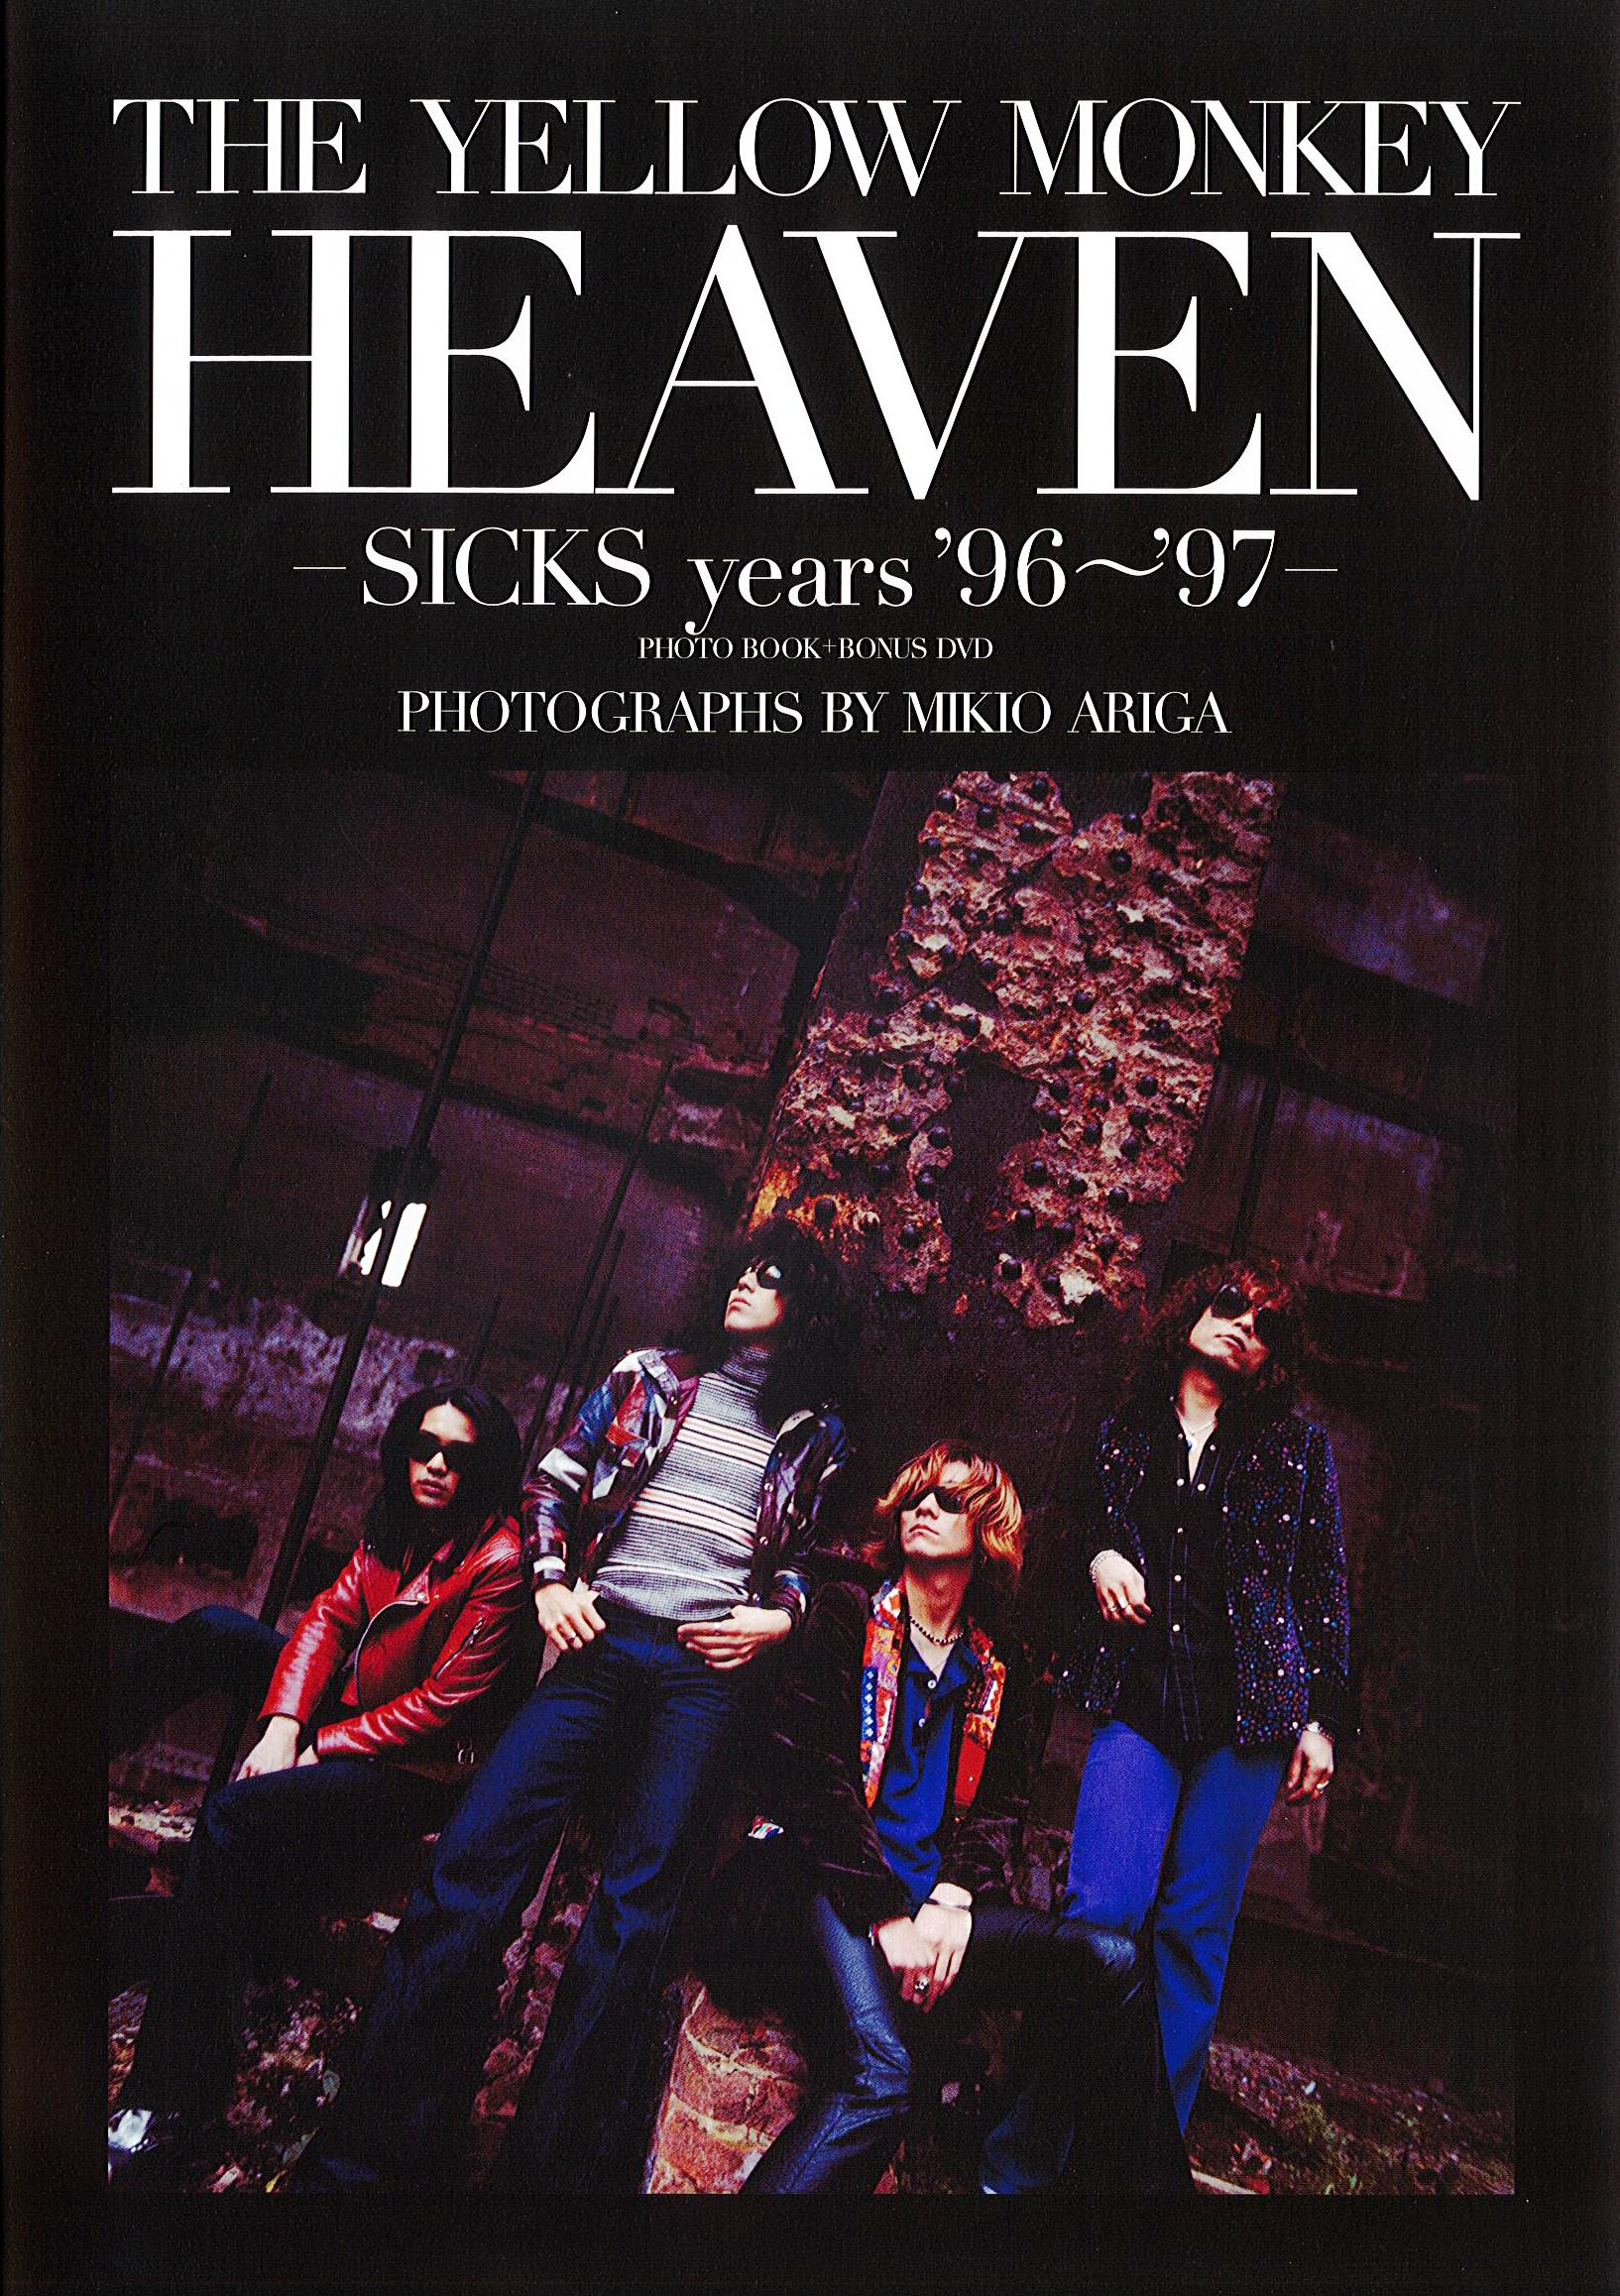 THE YELLOW MONKEY HEAVEN –SICKS years '96~'97-